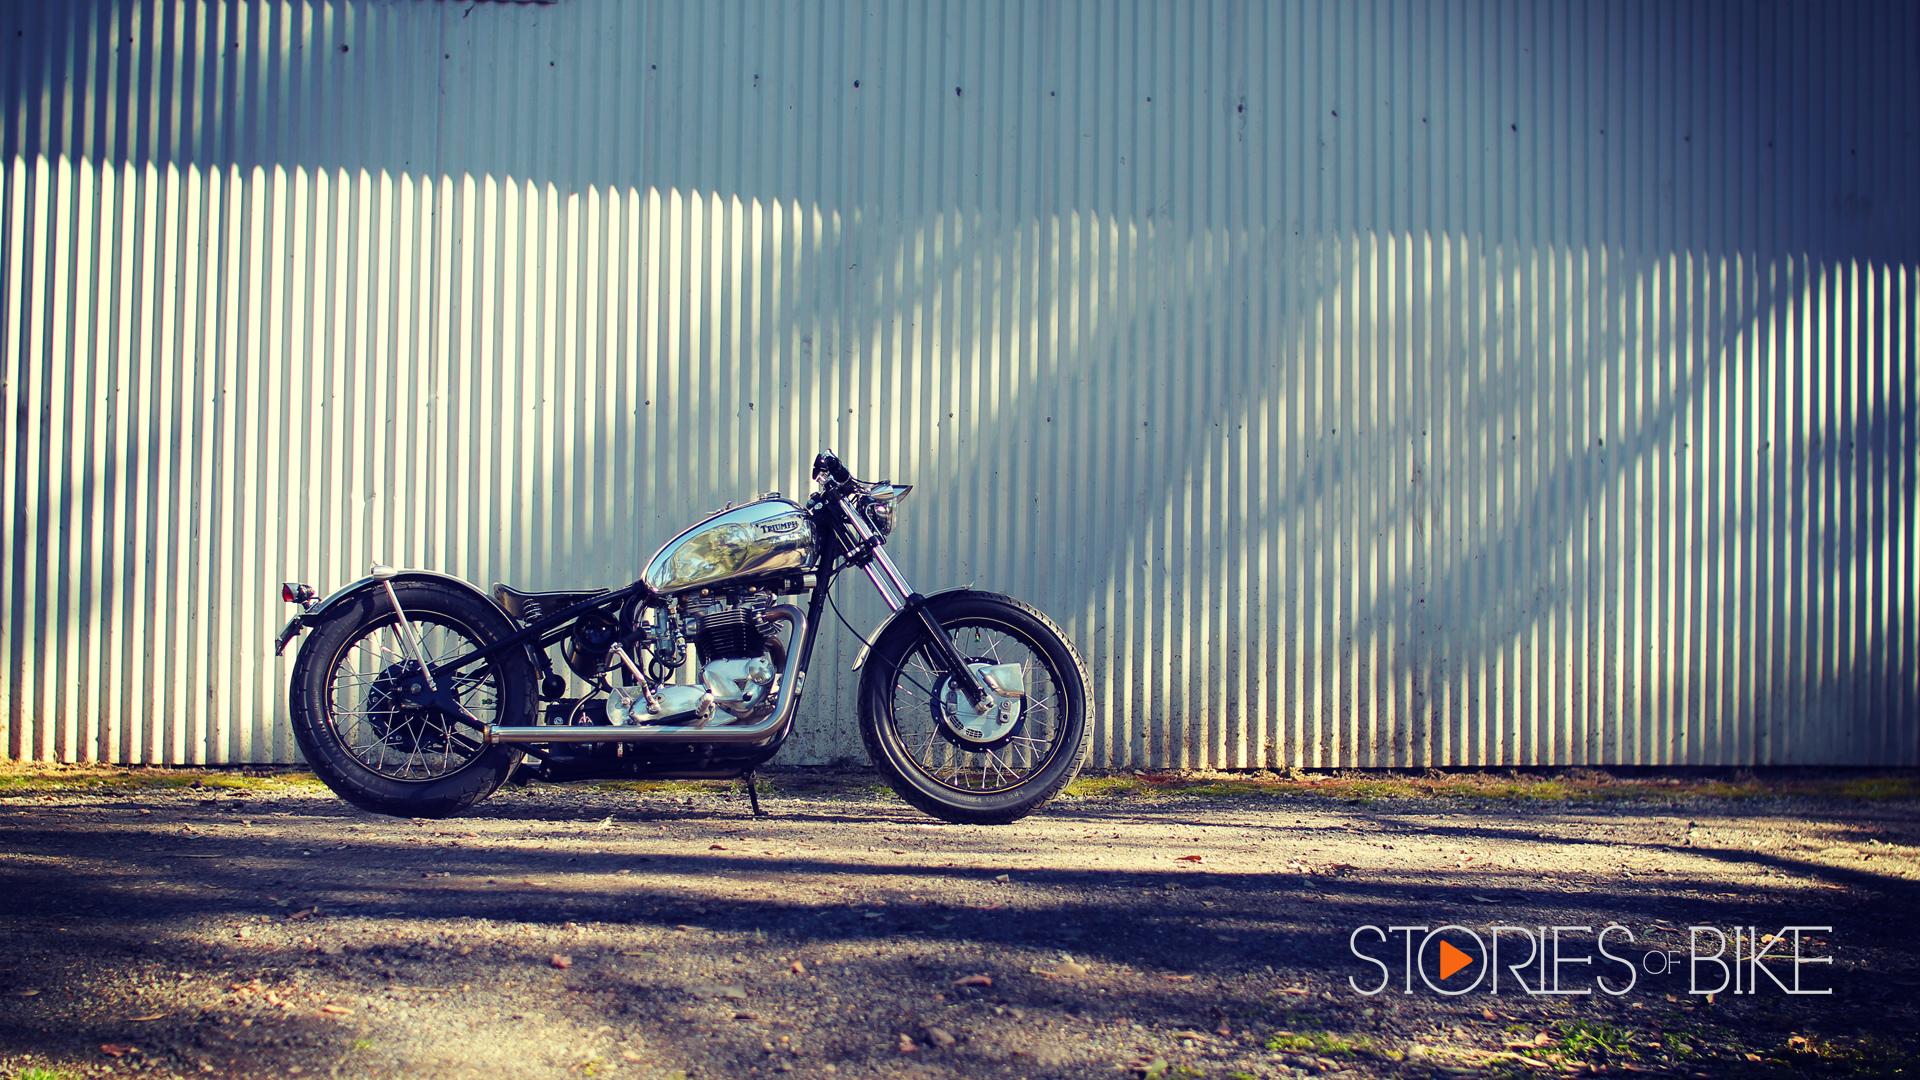 Stories_of_Bike_Publicity_Ep7_9.jpg